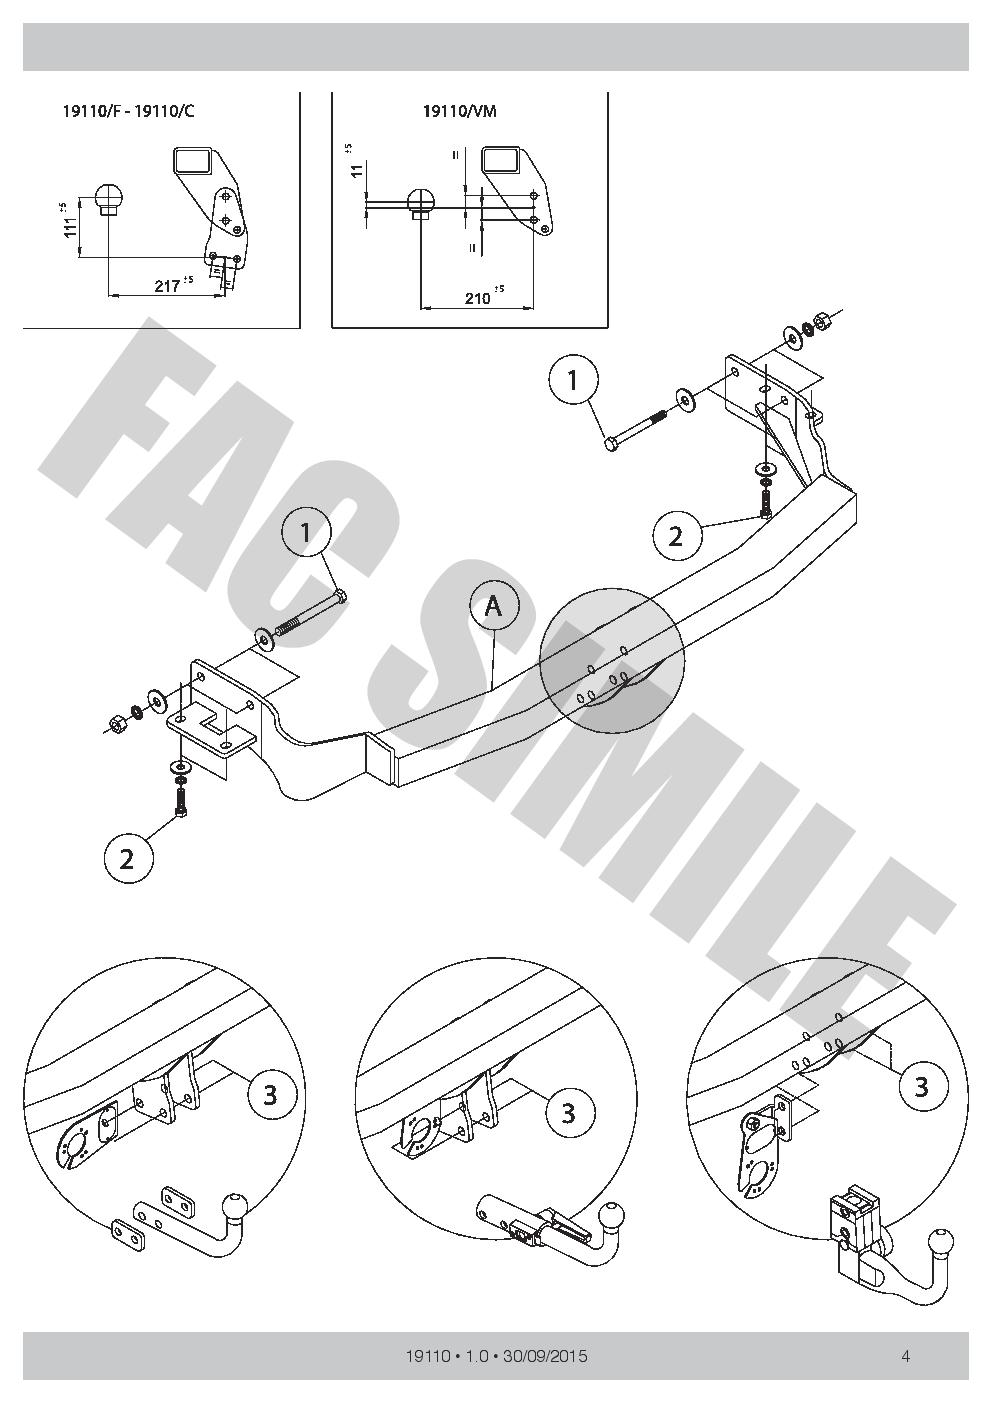 AHK Vertikale Abnehmbare Anhängerkupplung 7p C2 E-Satz Kia Sorento 09-12 1911/_B1